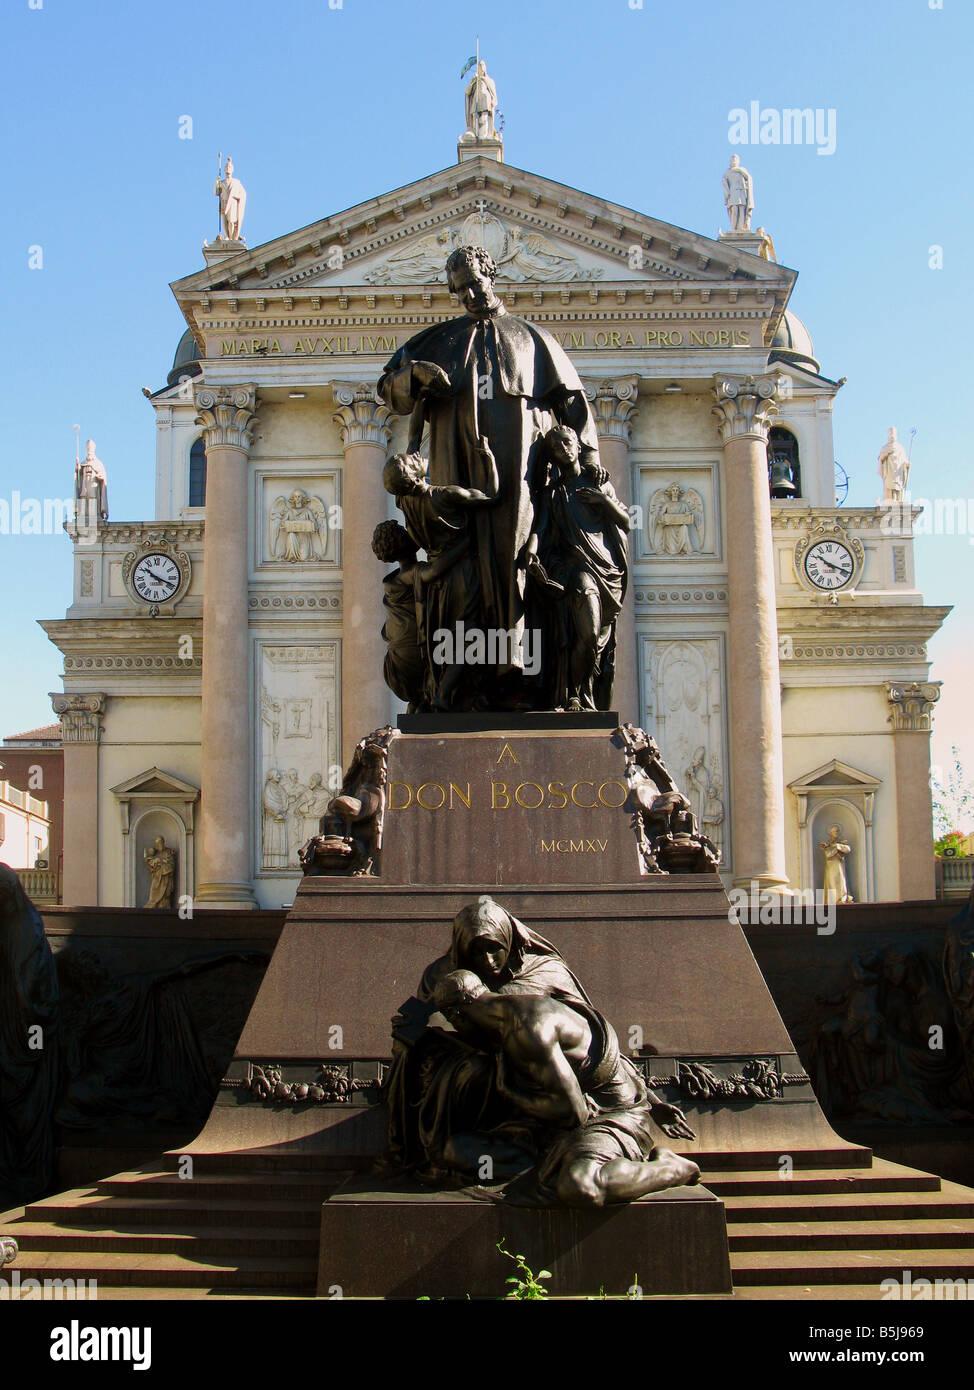 Turin. Don John Bosco monument. - Stock Image